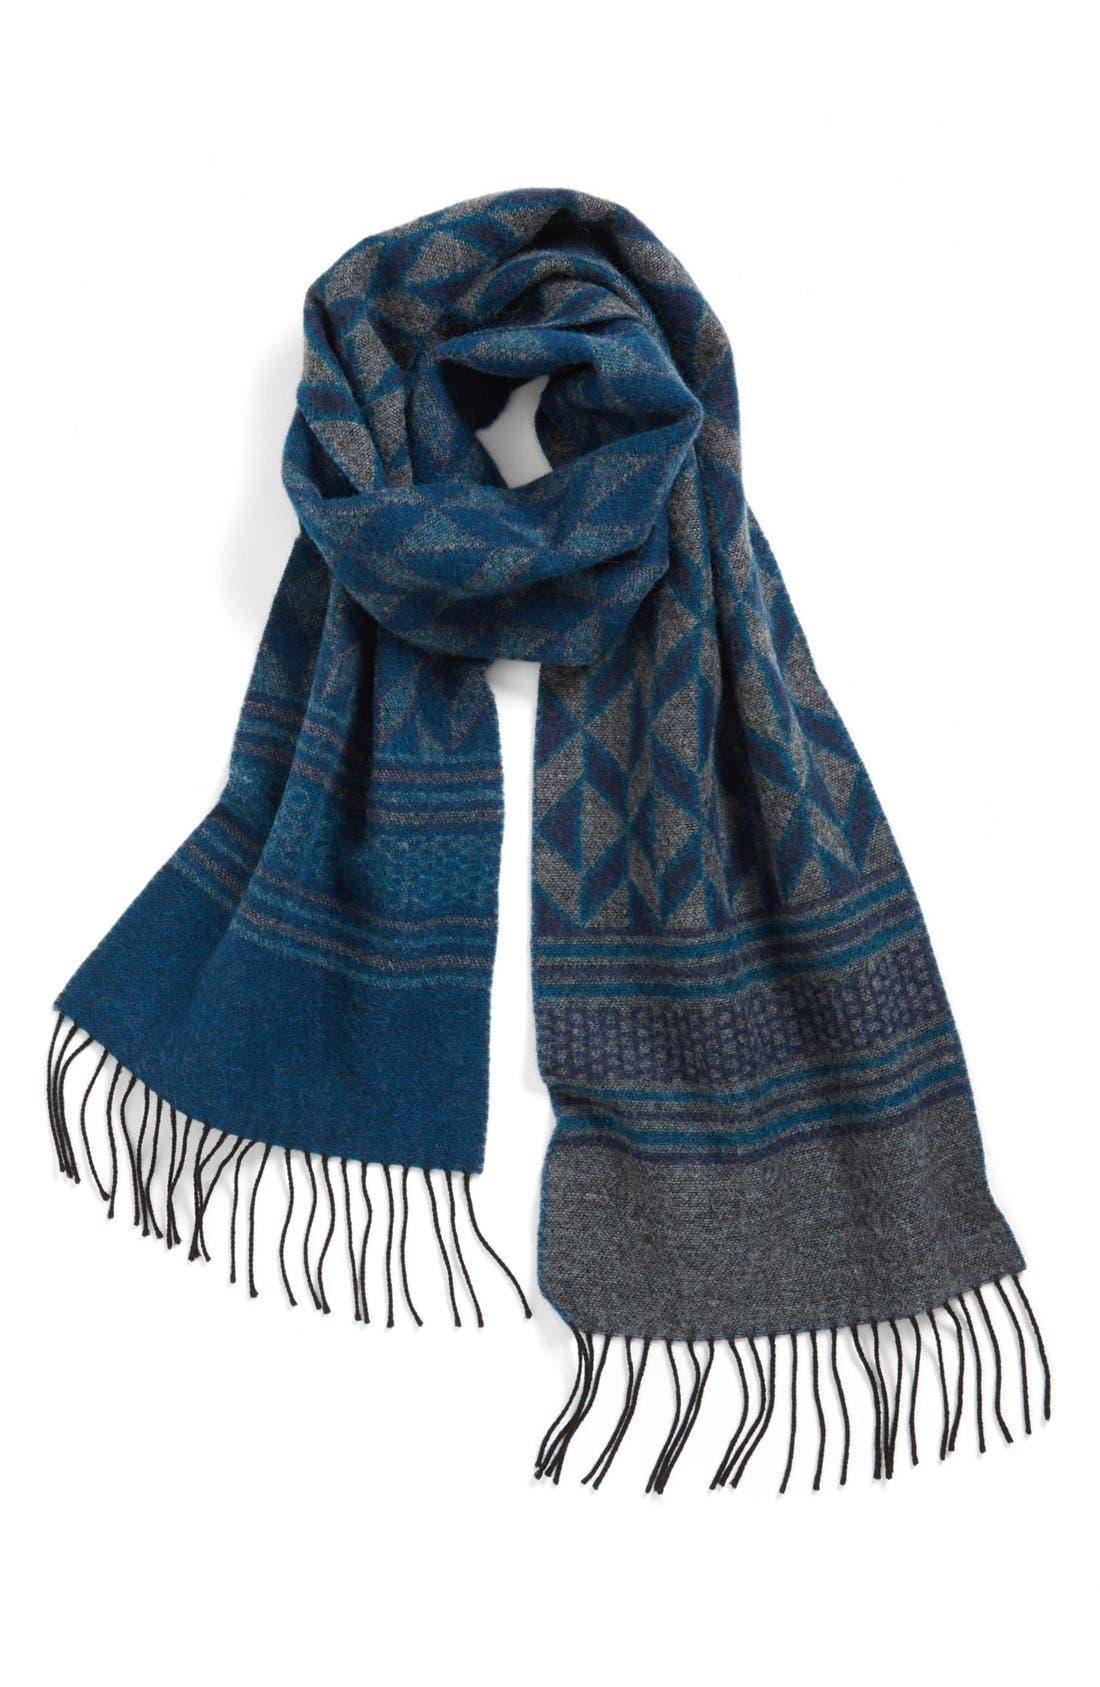 Alternate Image 1 Selected - Ted Baker London Wool Scarf